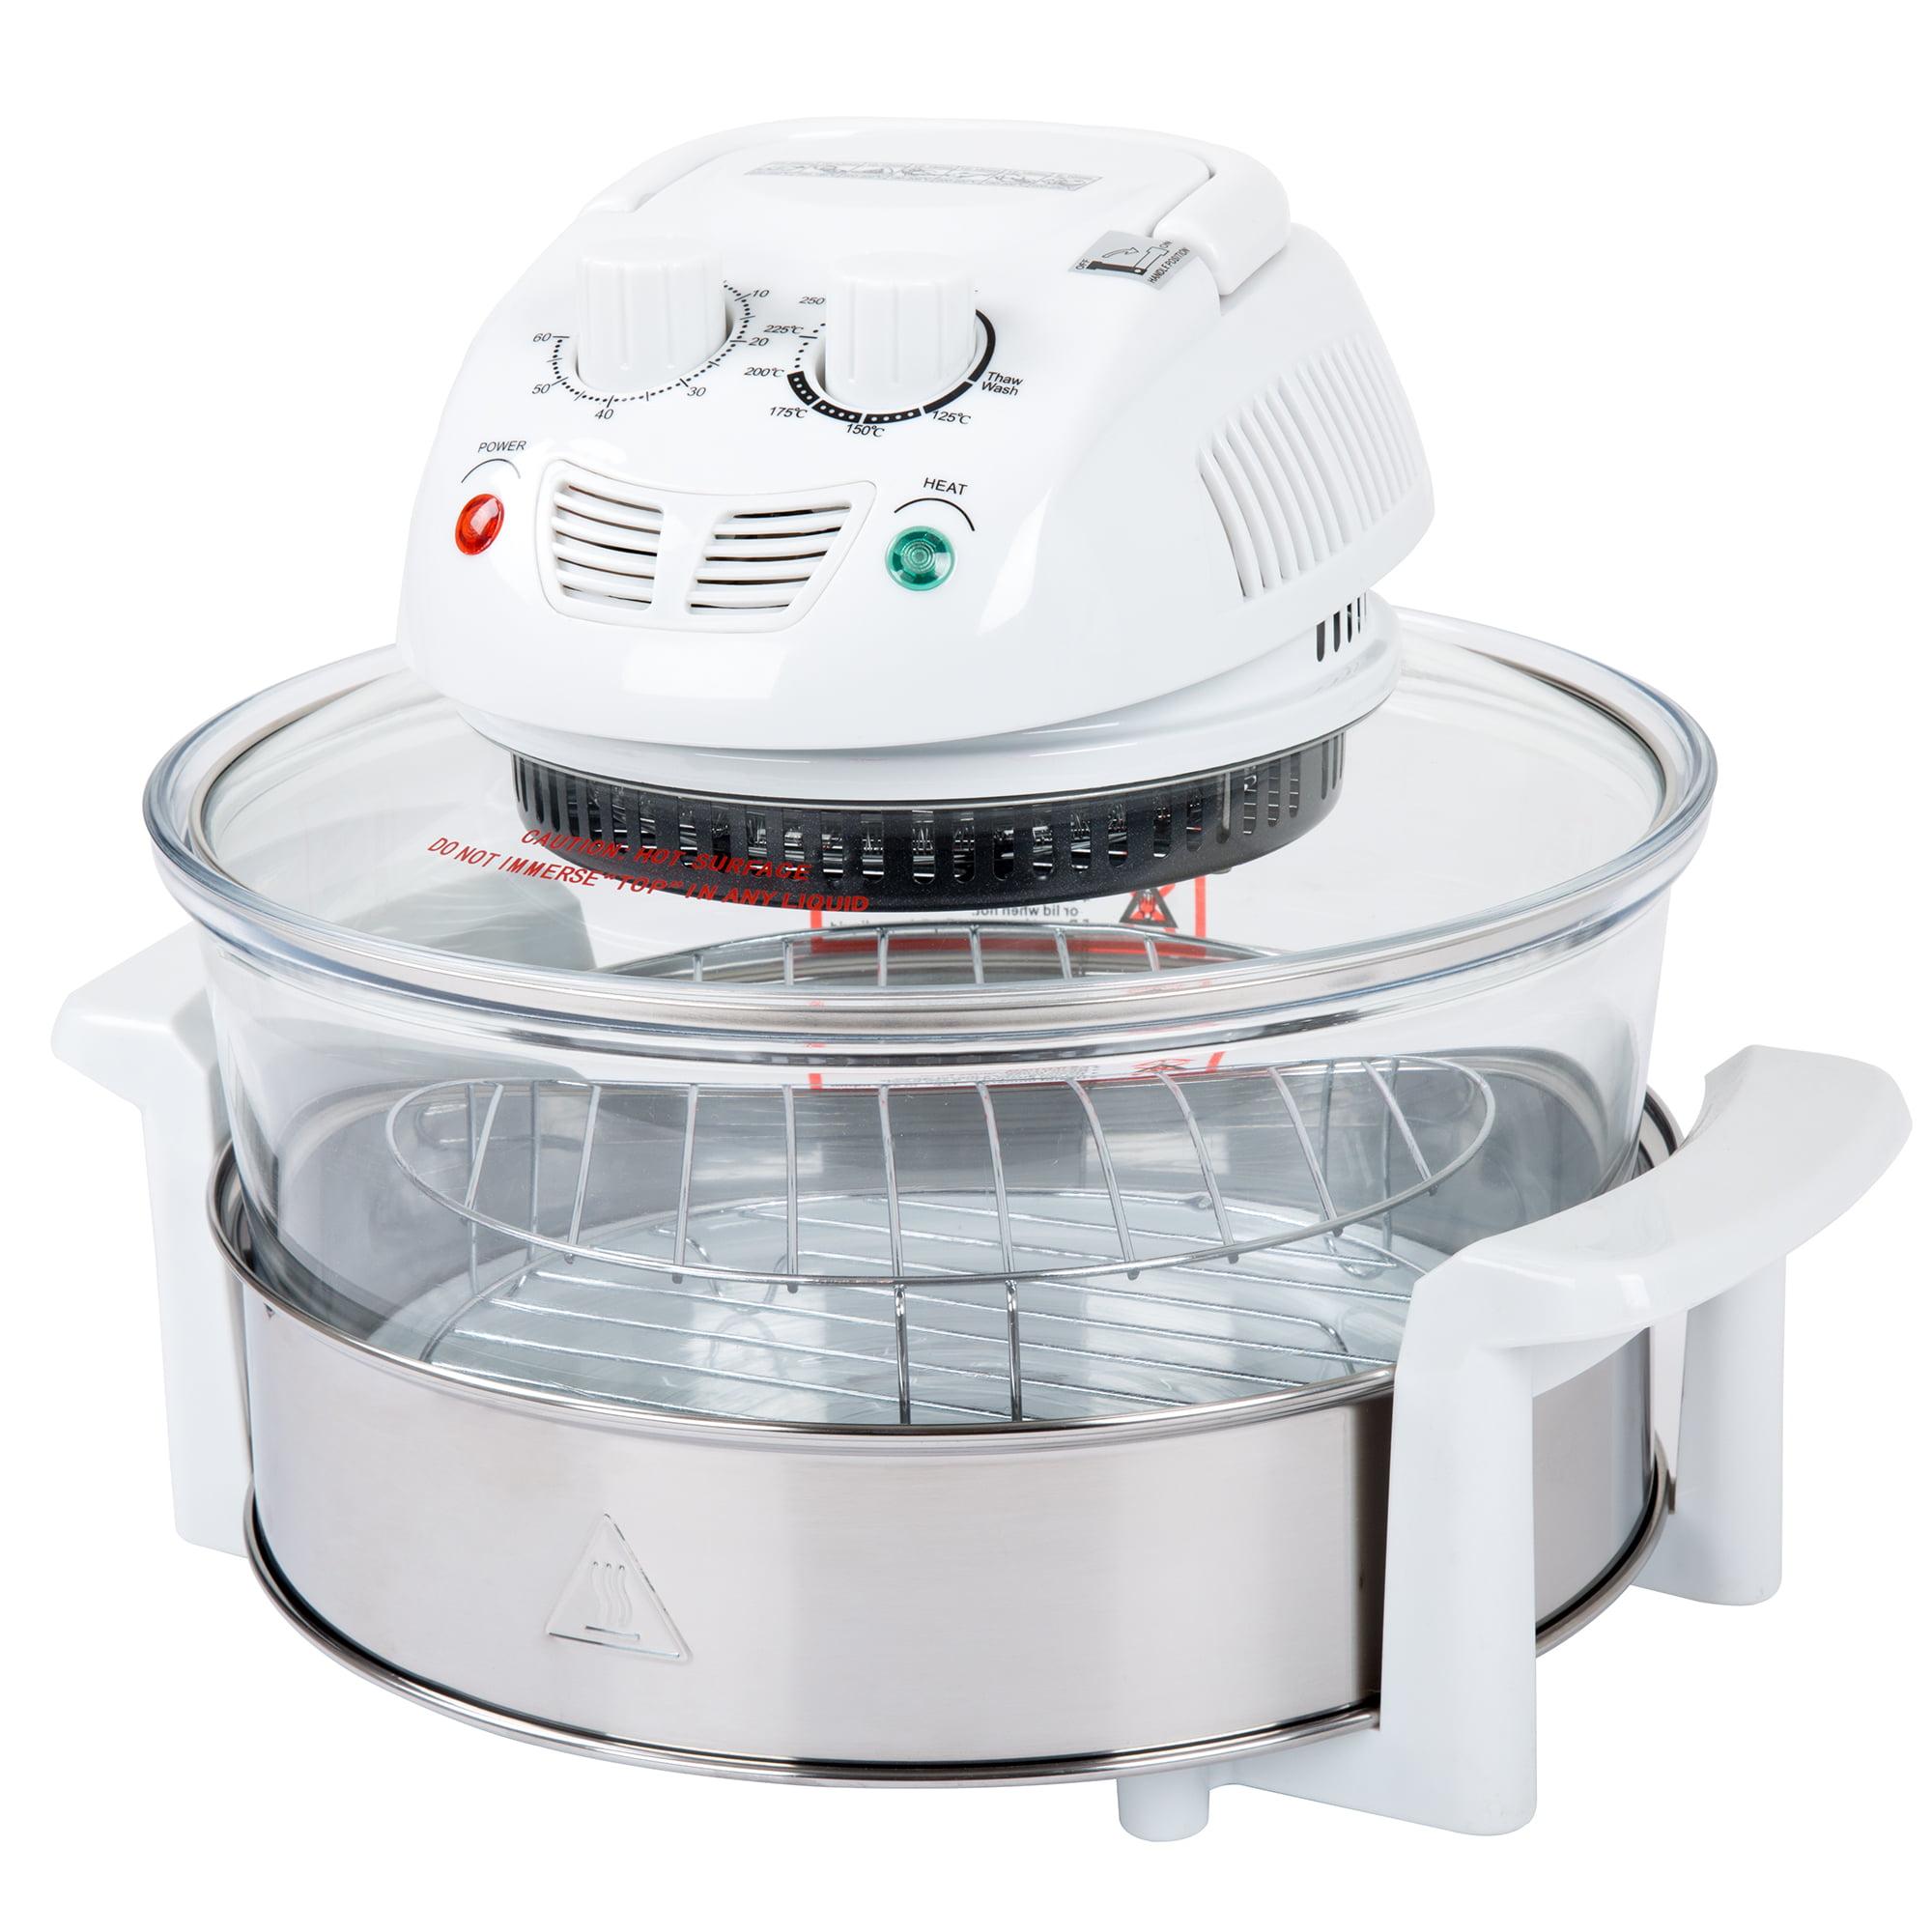 Classic Cuisine 12-17 Quart 1200W Halogen Tabletop Oven - White